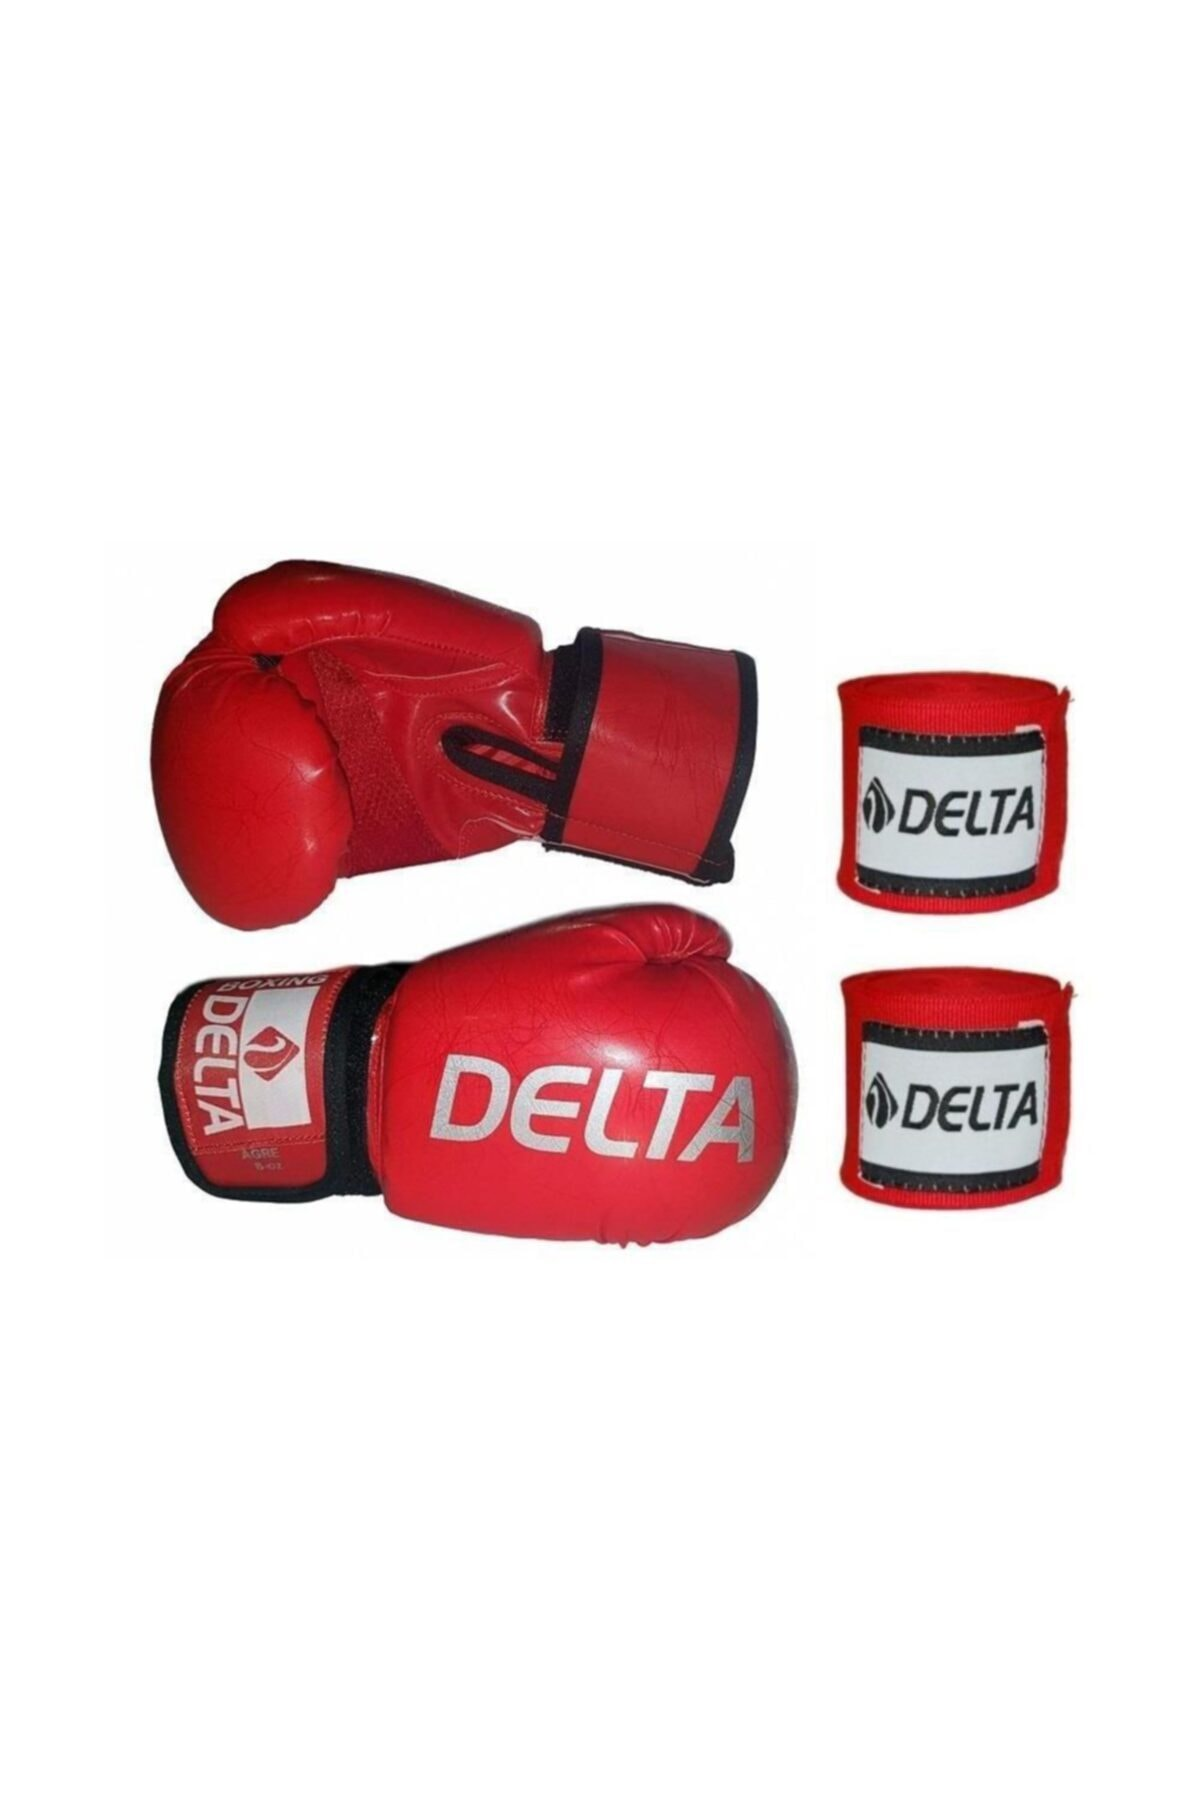 Delta Agre Deluxe Pu Kırmızı Boks Eldiveni + Boks Bandajı Seti 1